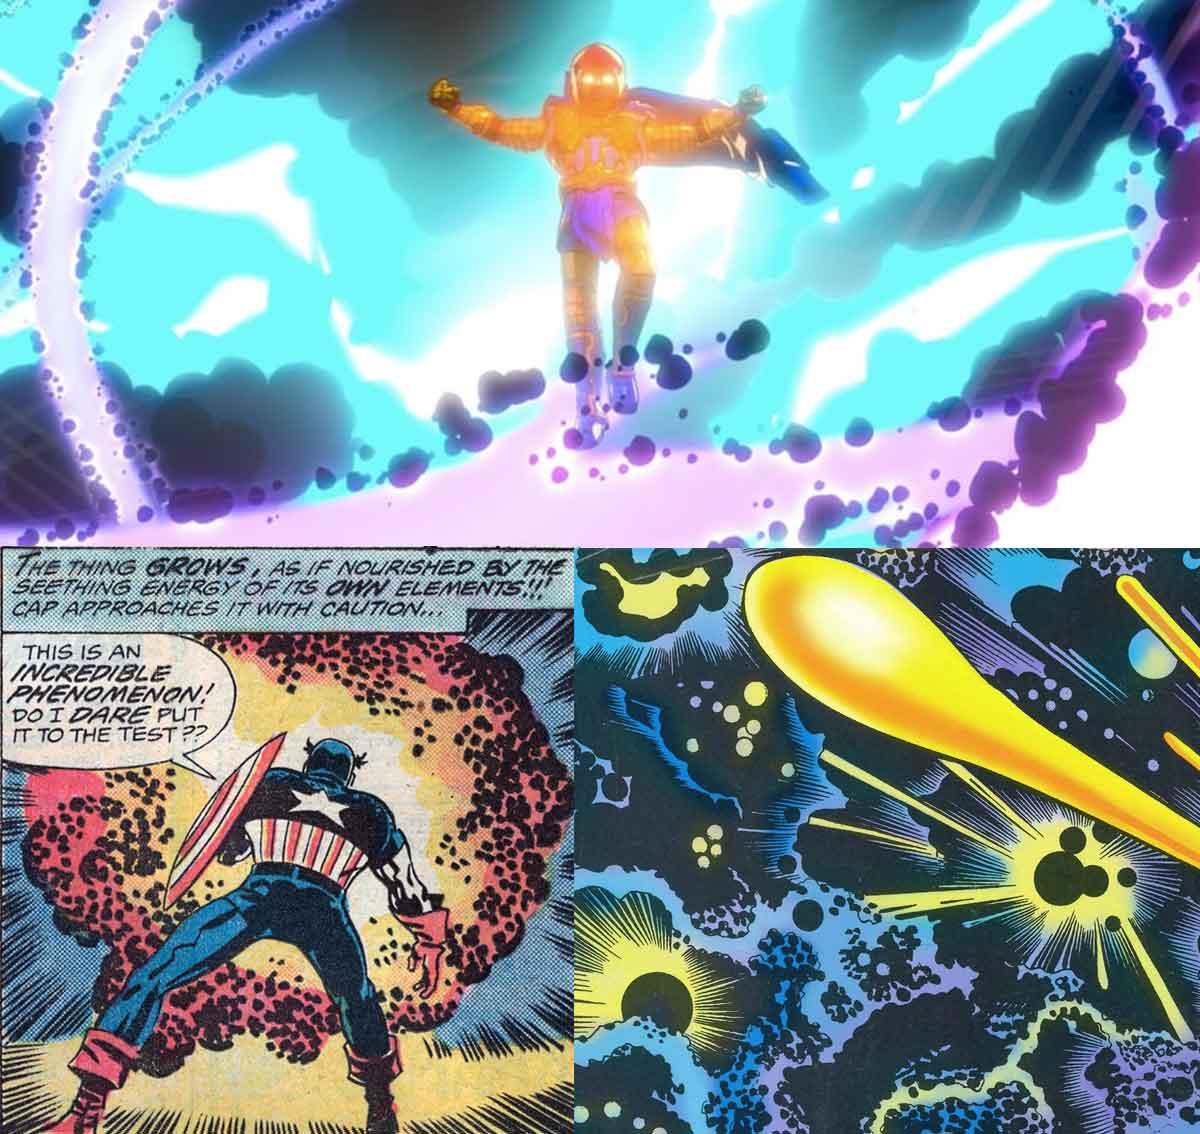 Marvel Studios Kirby Krackle what if